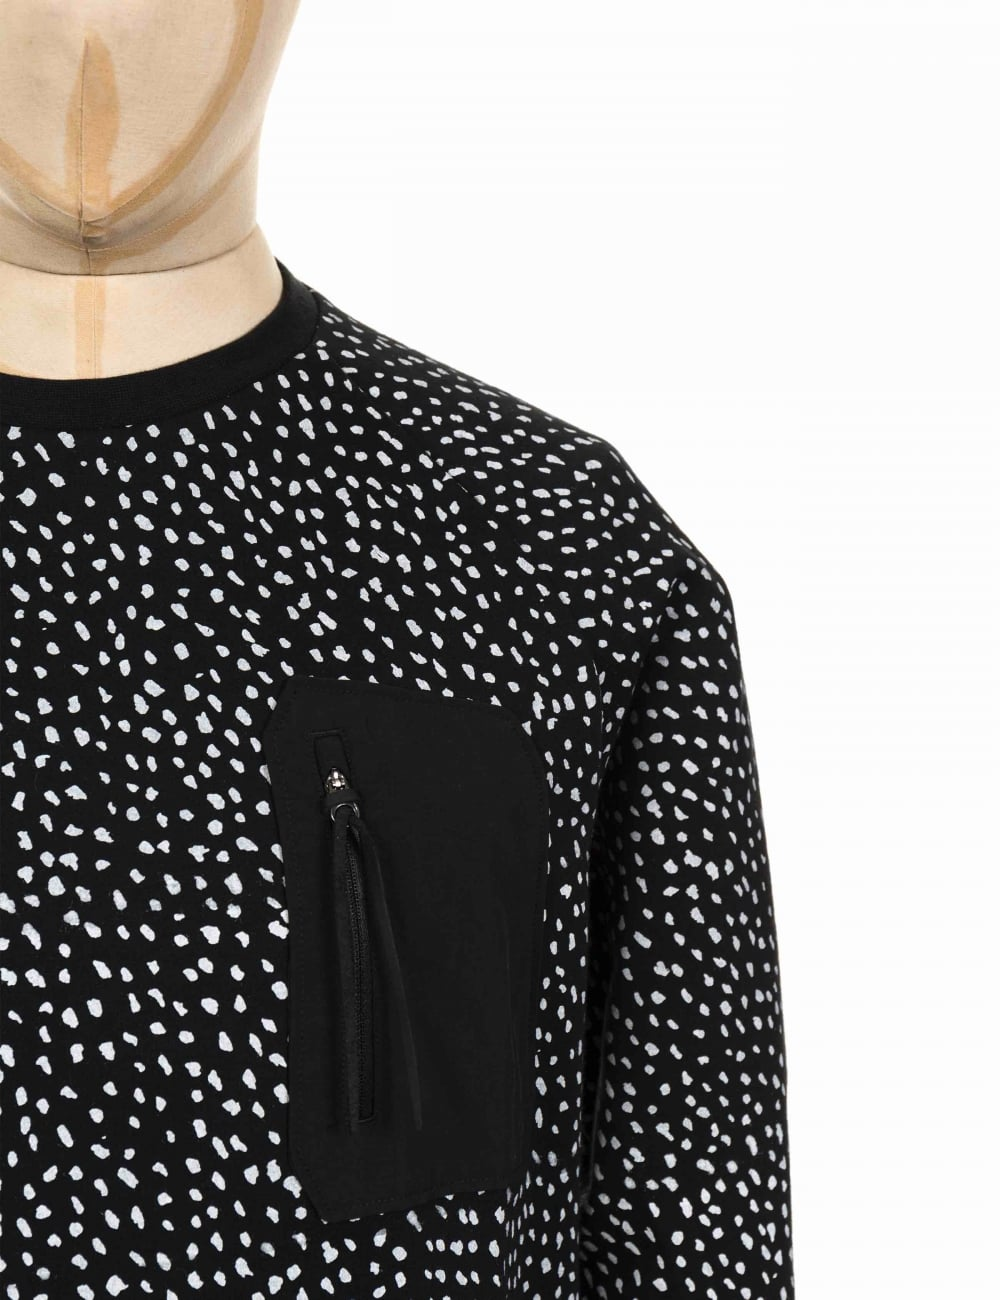 84aa2dc39c0d0 Adidas Originals NMD Pocket Crewneck Sweeatshirt - Black White ...